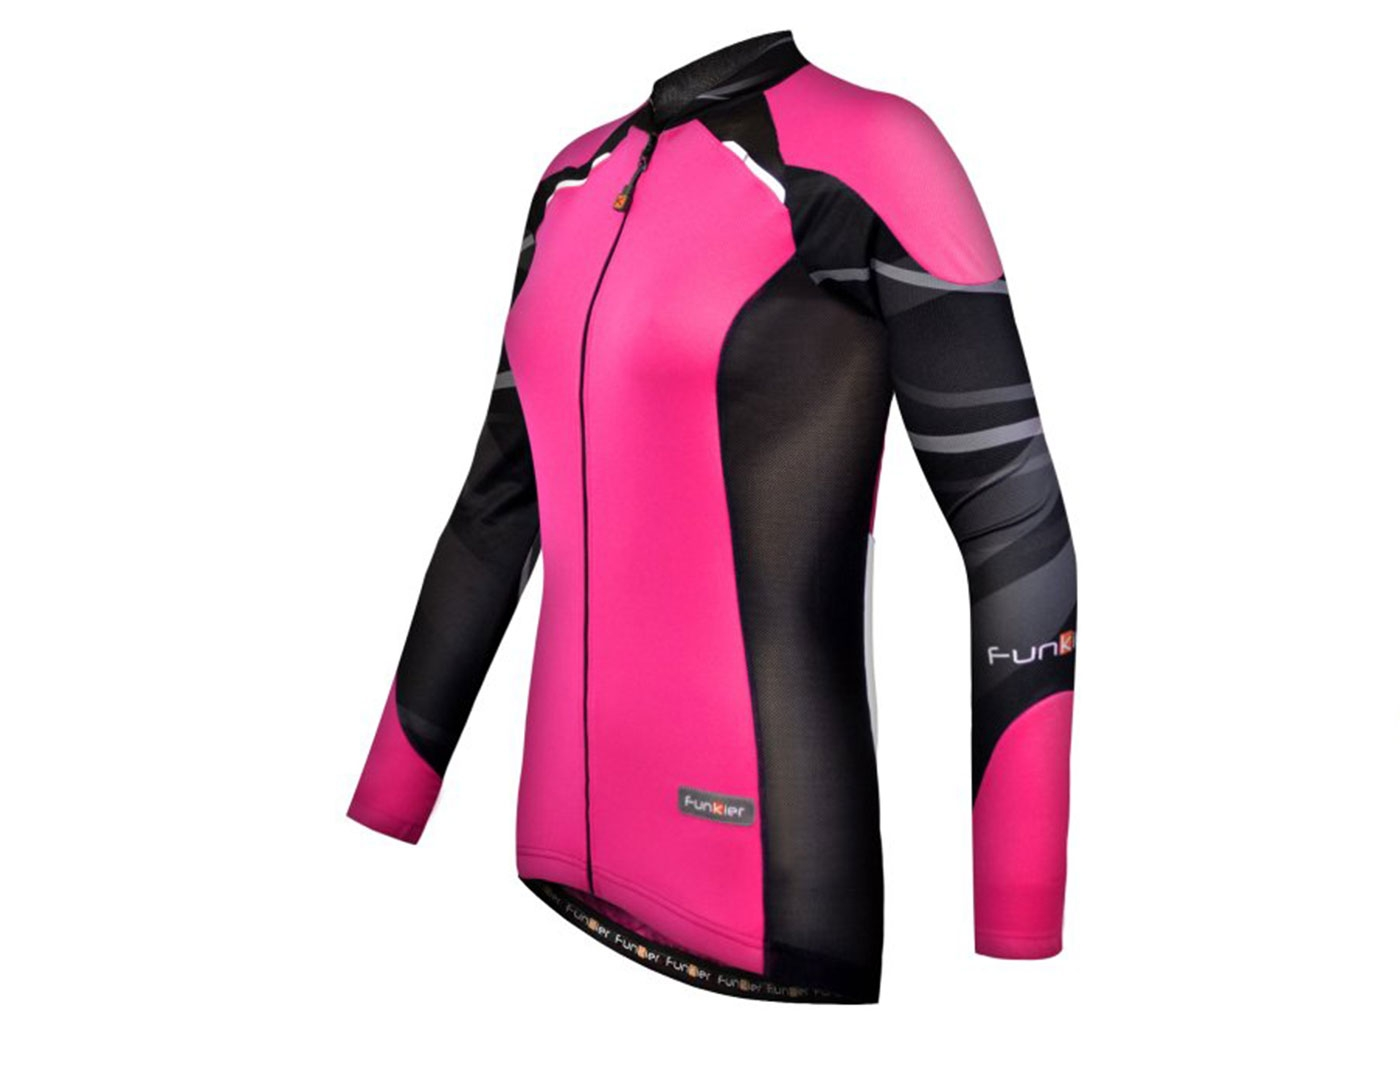 Велофутболка FunkierBike женская WJ-730-1-L Pink  с длин. рукавом  (Розово-черная)